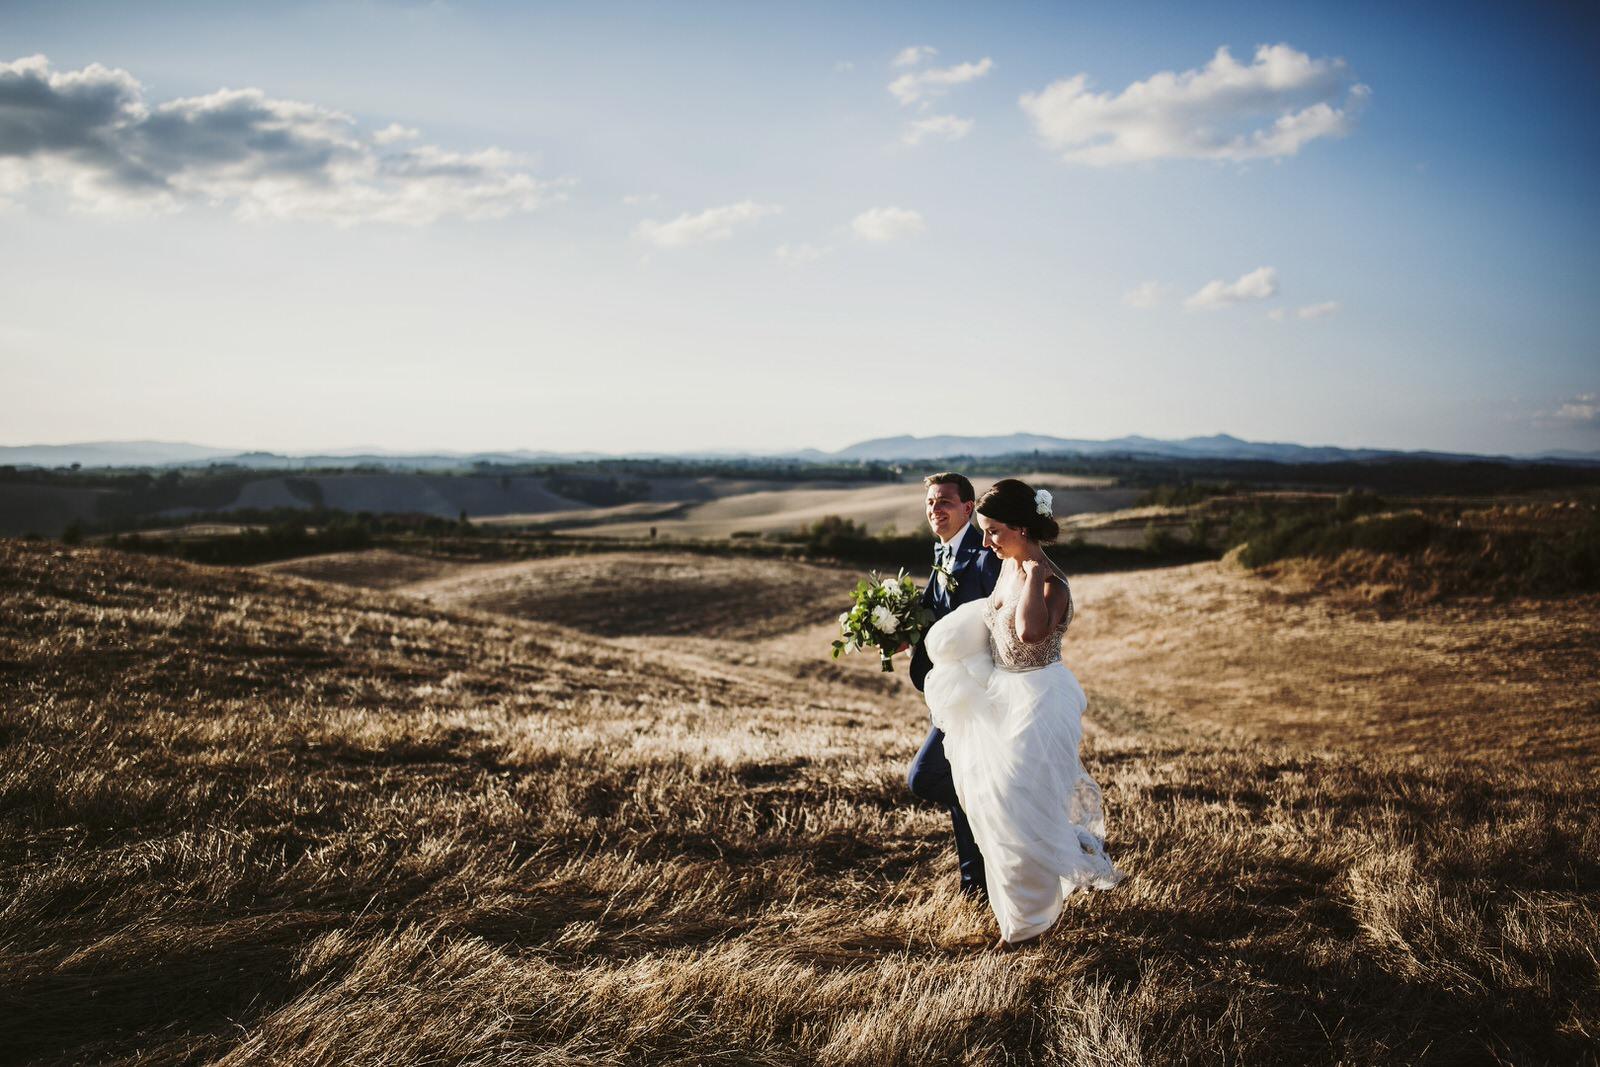 wedding photographer in italy-venice-tuscany-florence-amalfi coast-como lake-villa del balbianello-siena-amalfi-ravello-belmond-villa cimbrone69